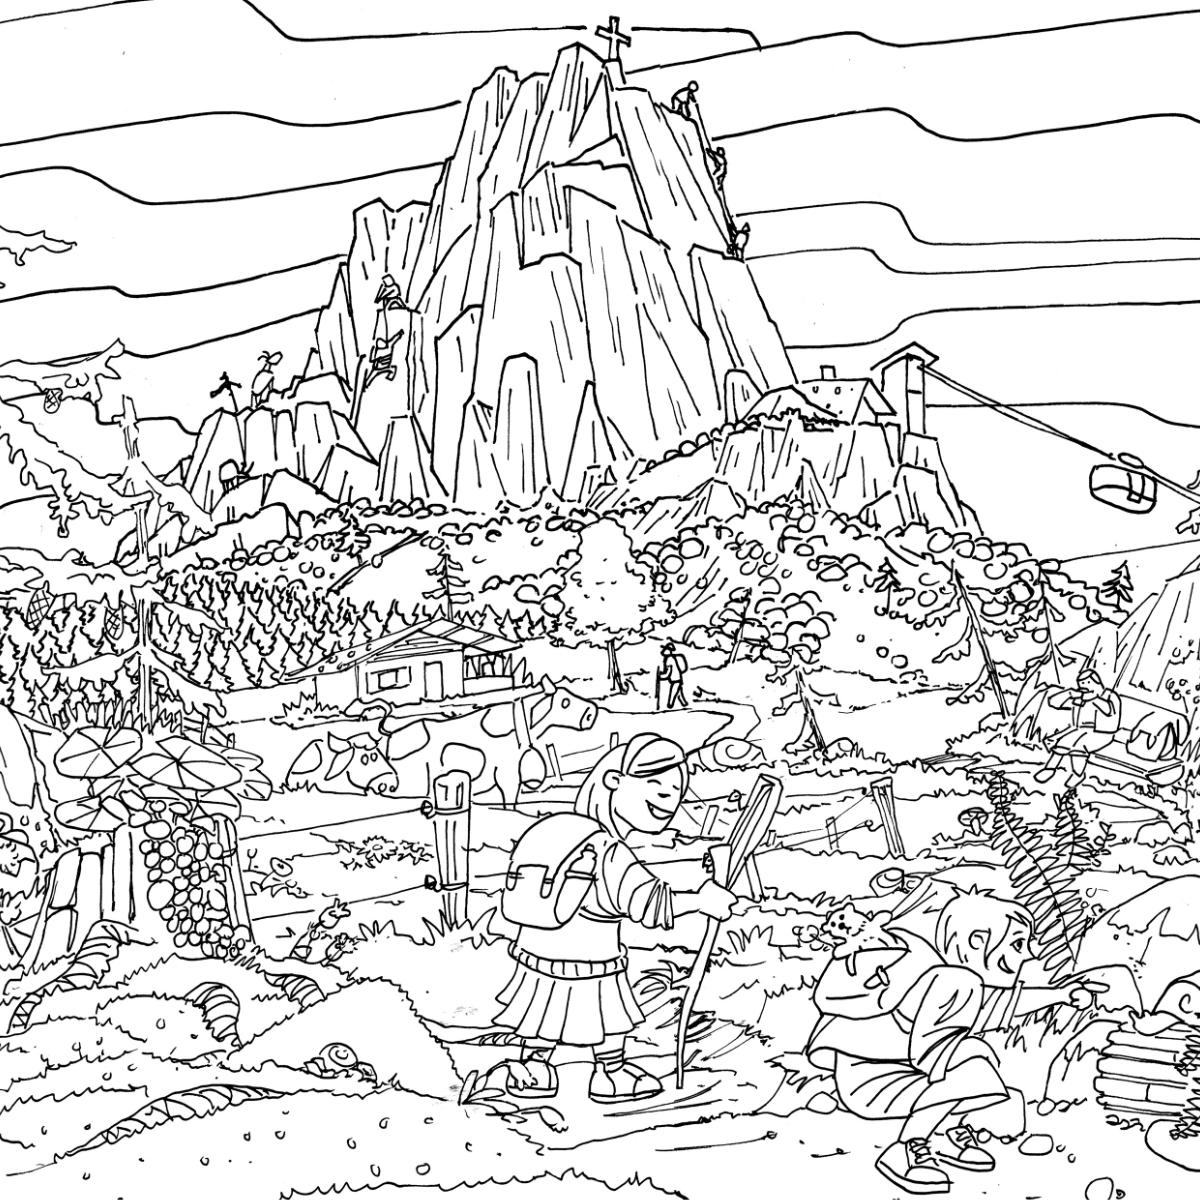 berge-mountain-alps-refugee.jpg